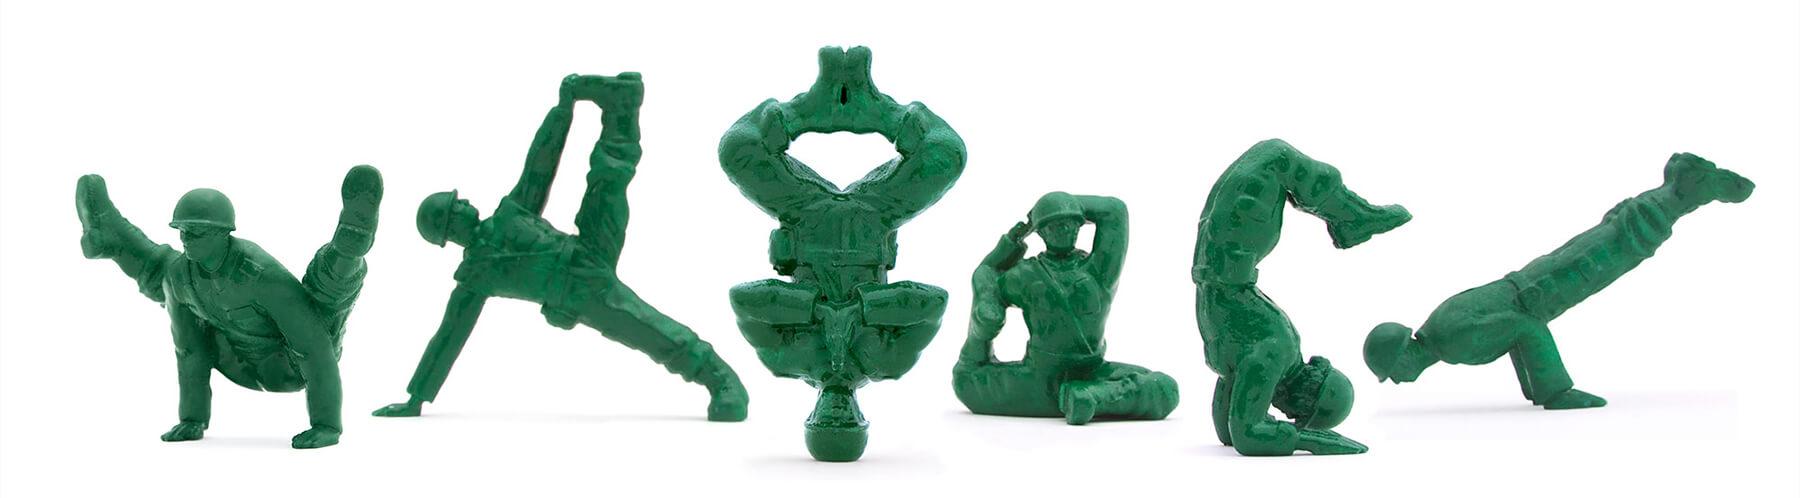 yoga joes toy (1)